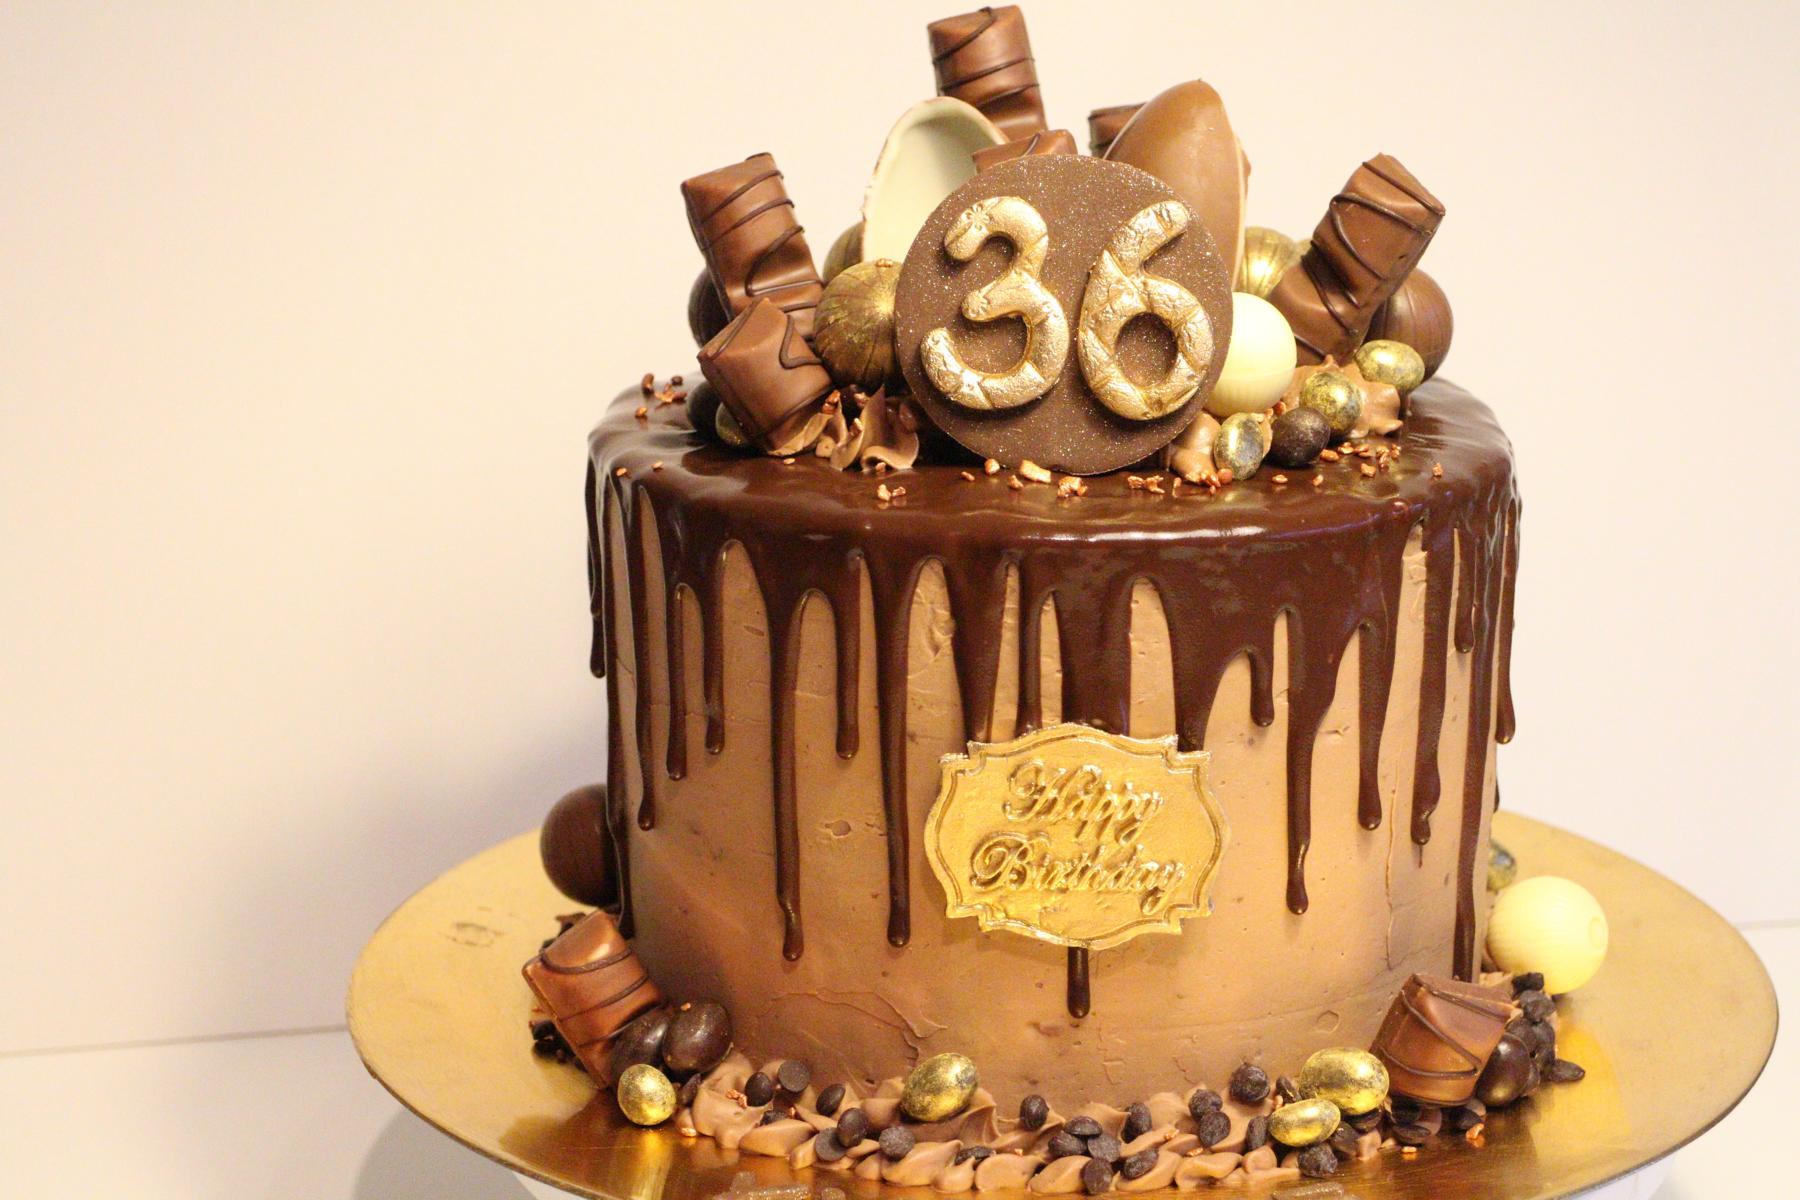 400 G Sahne 800 Vollmilchschokolade 100 Butter